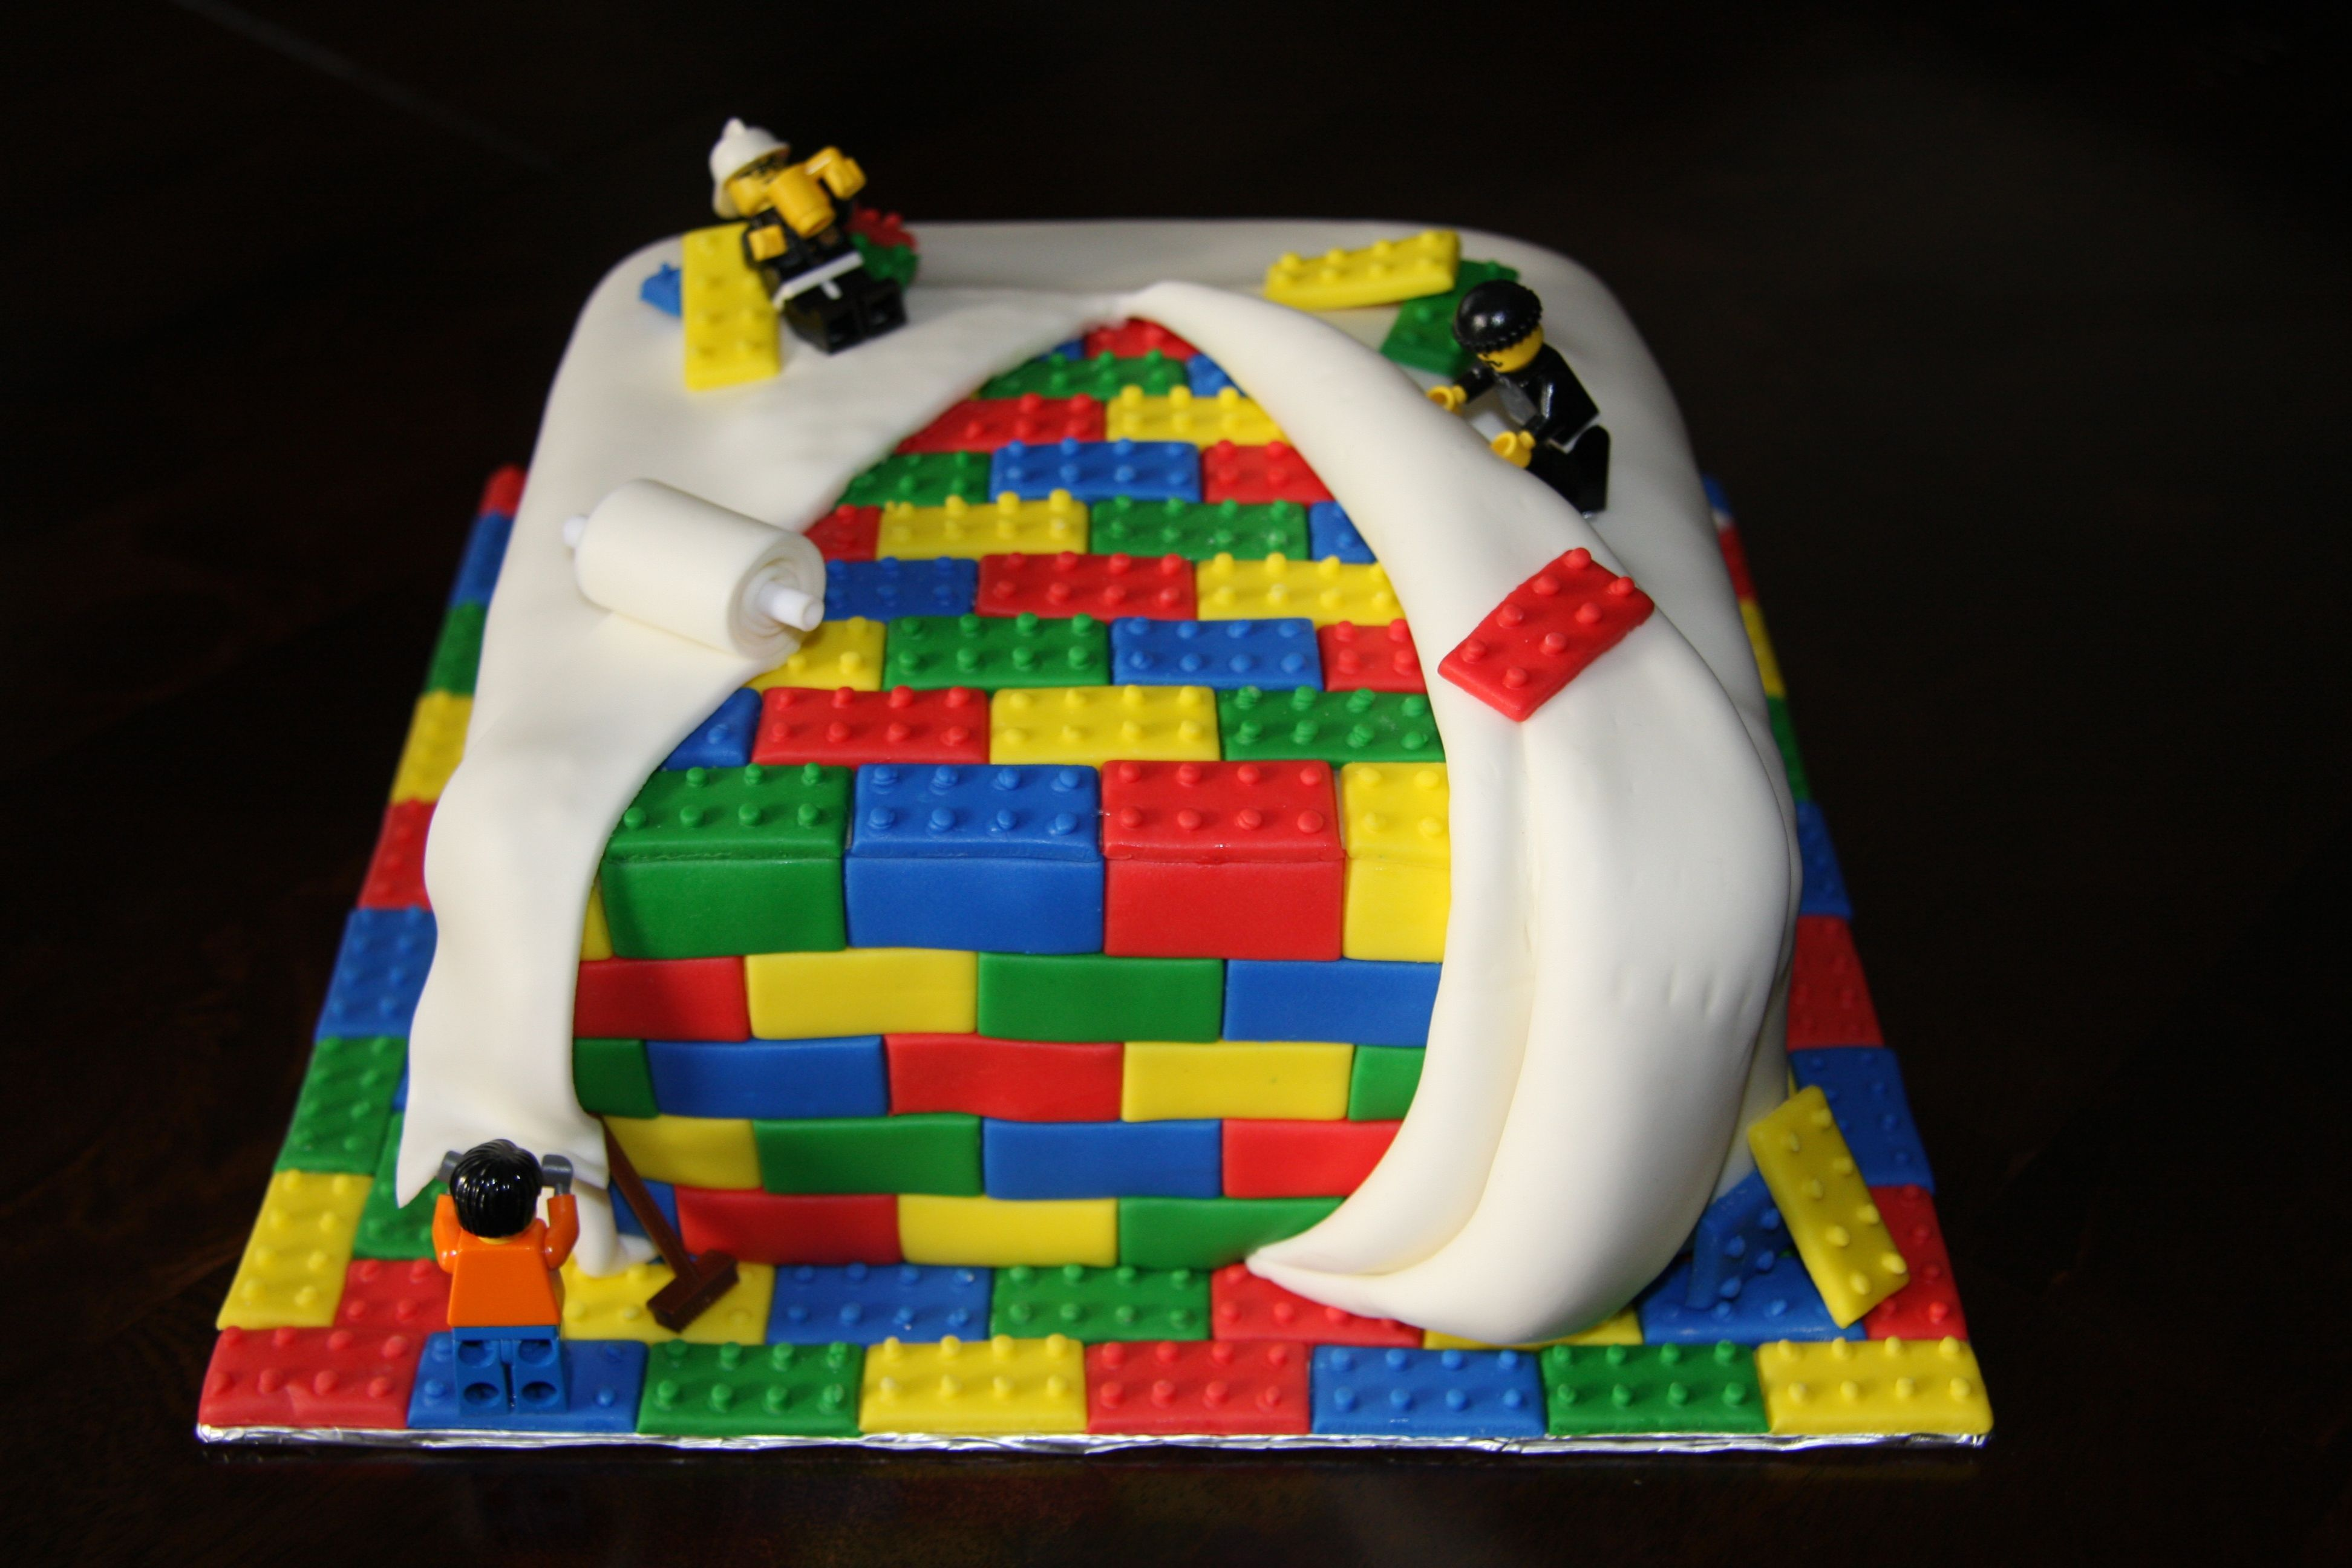 Legocake Tylers 5th Birthday LEGO TIME Pinterest Lego